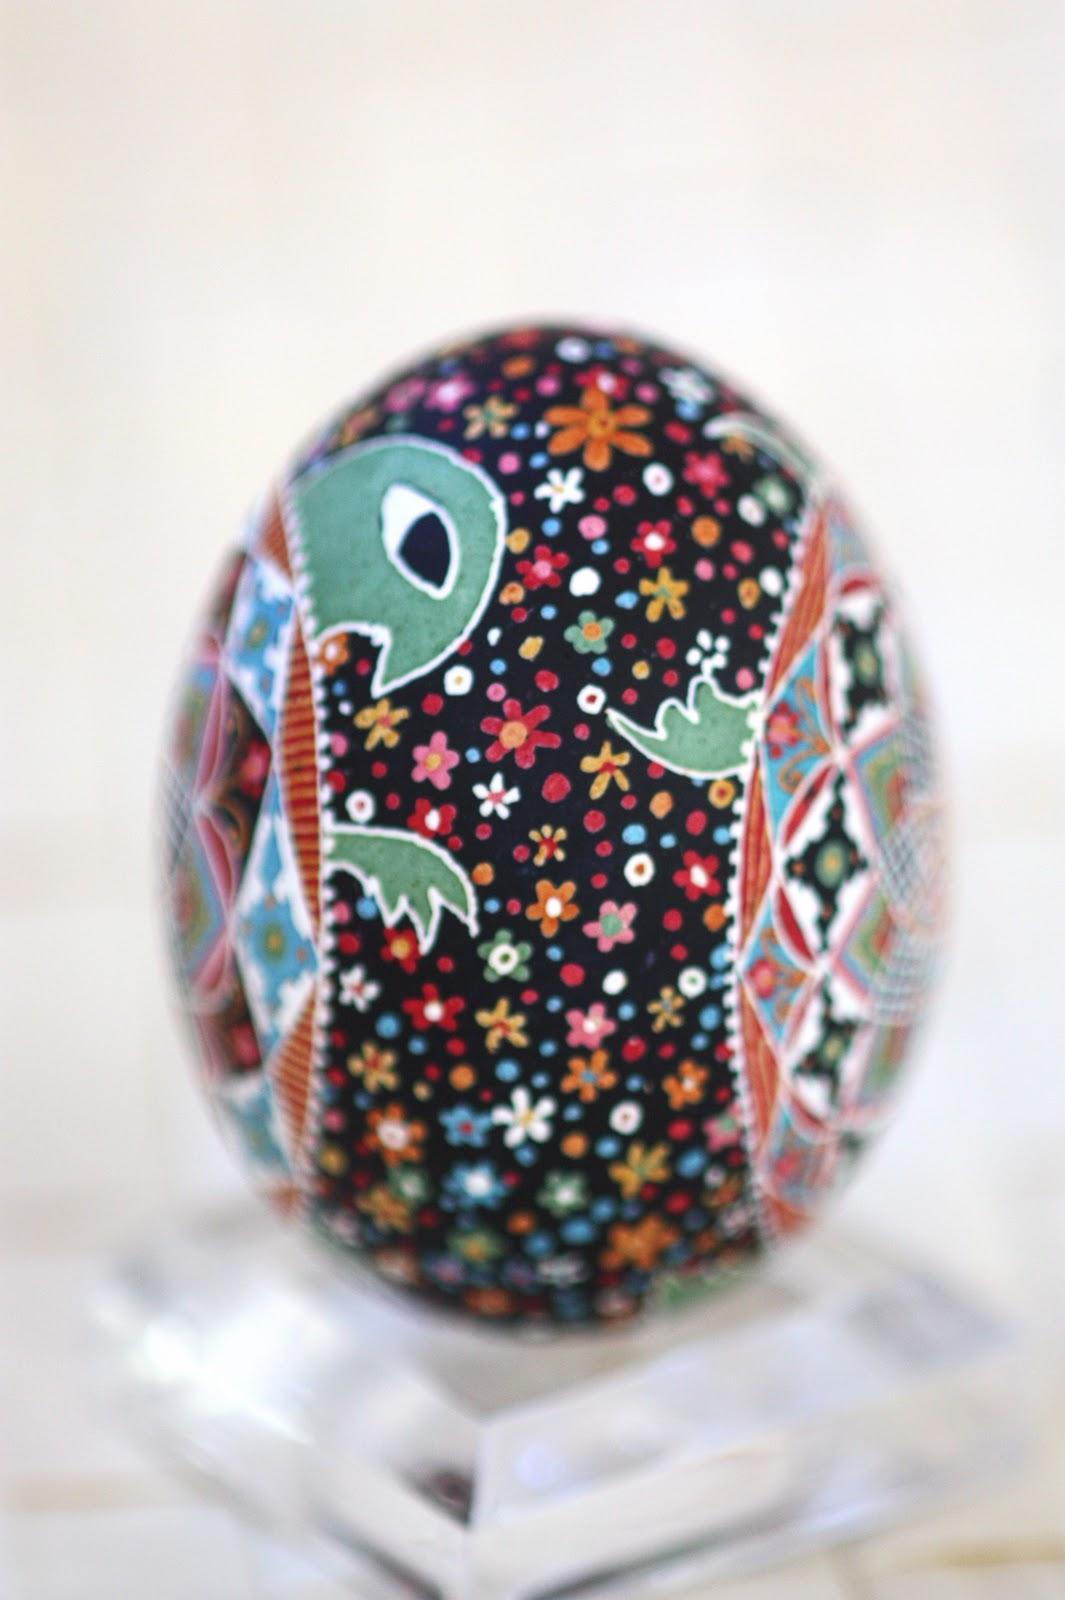 katyegg design  friday egg  flying turtle in space